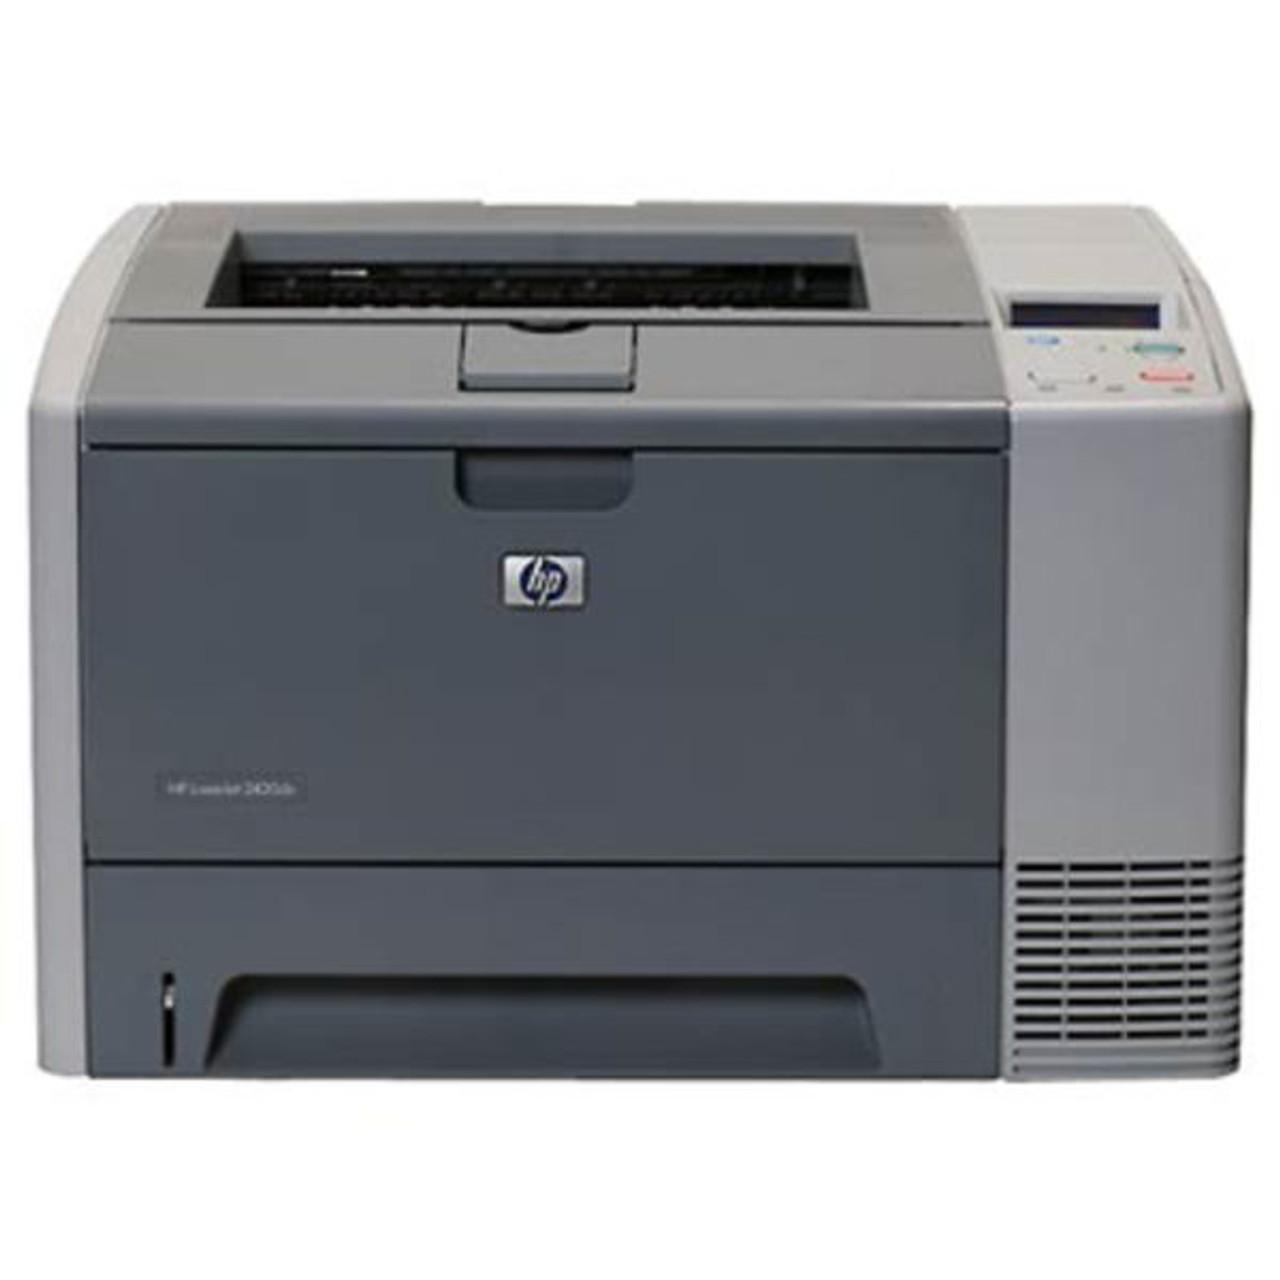 HP LaserJet 2420n Laser Printer